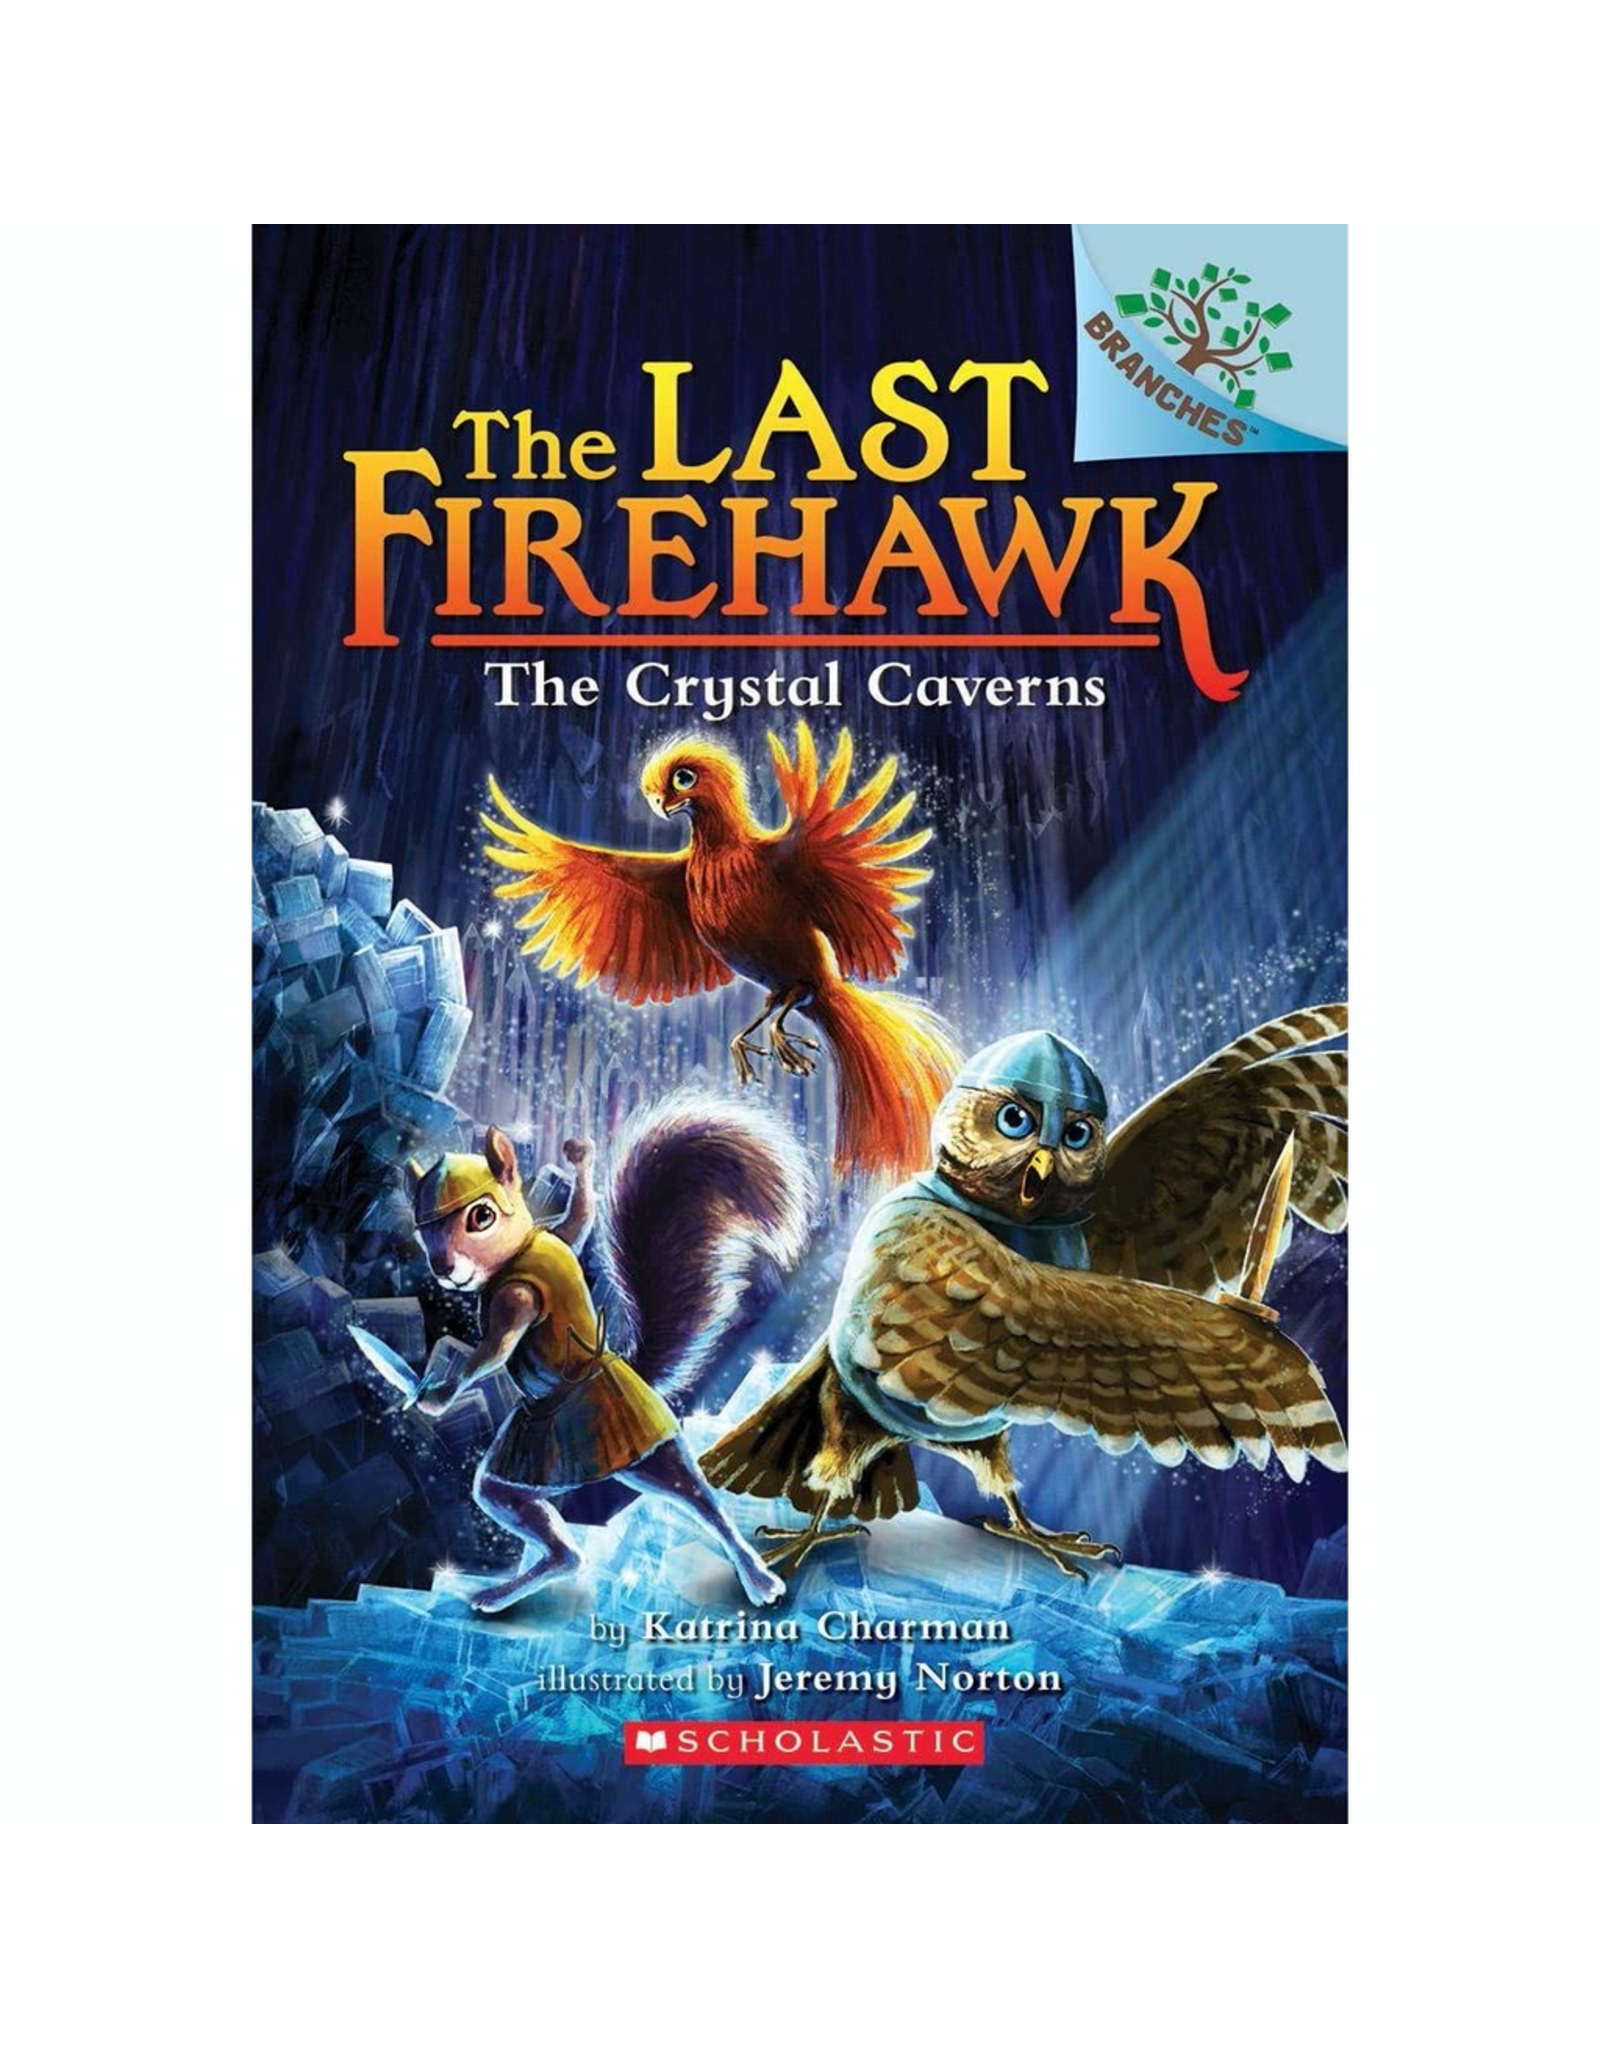 Scholastic LAST FIREHAWK #2 THE CRYSTAL CAVERNS